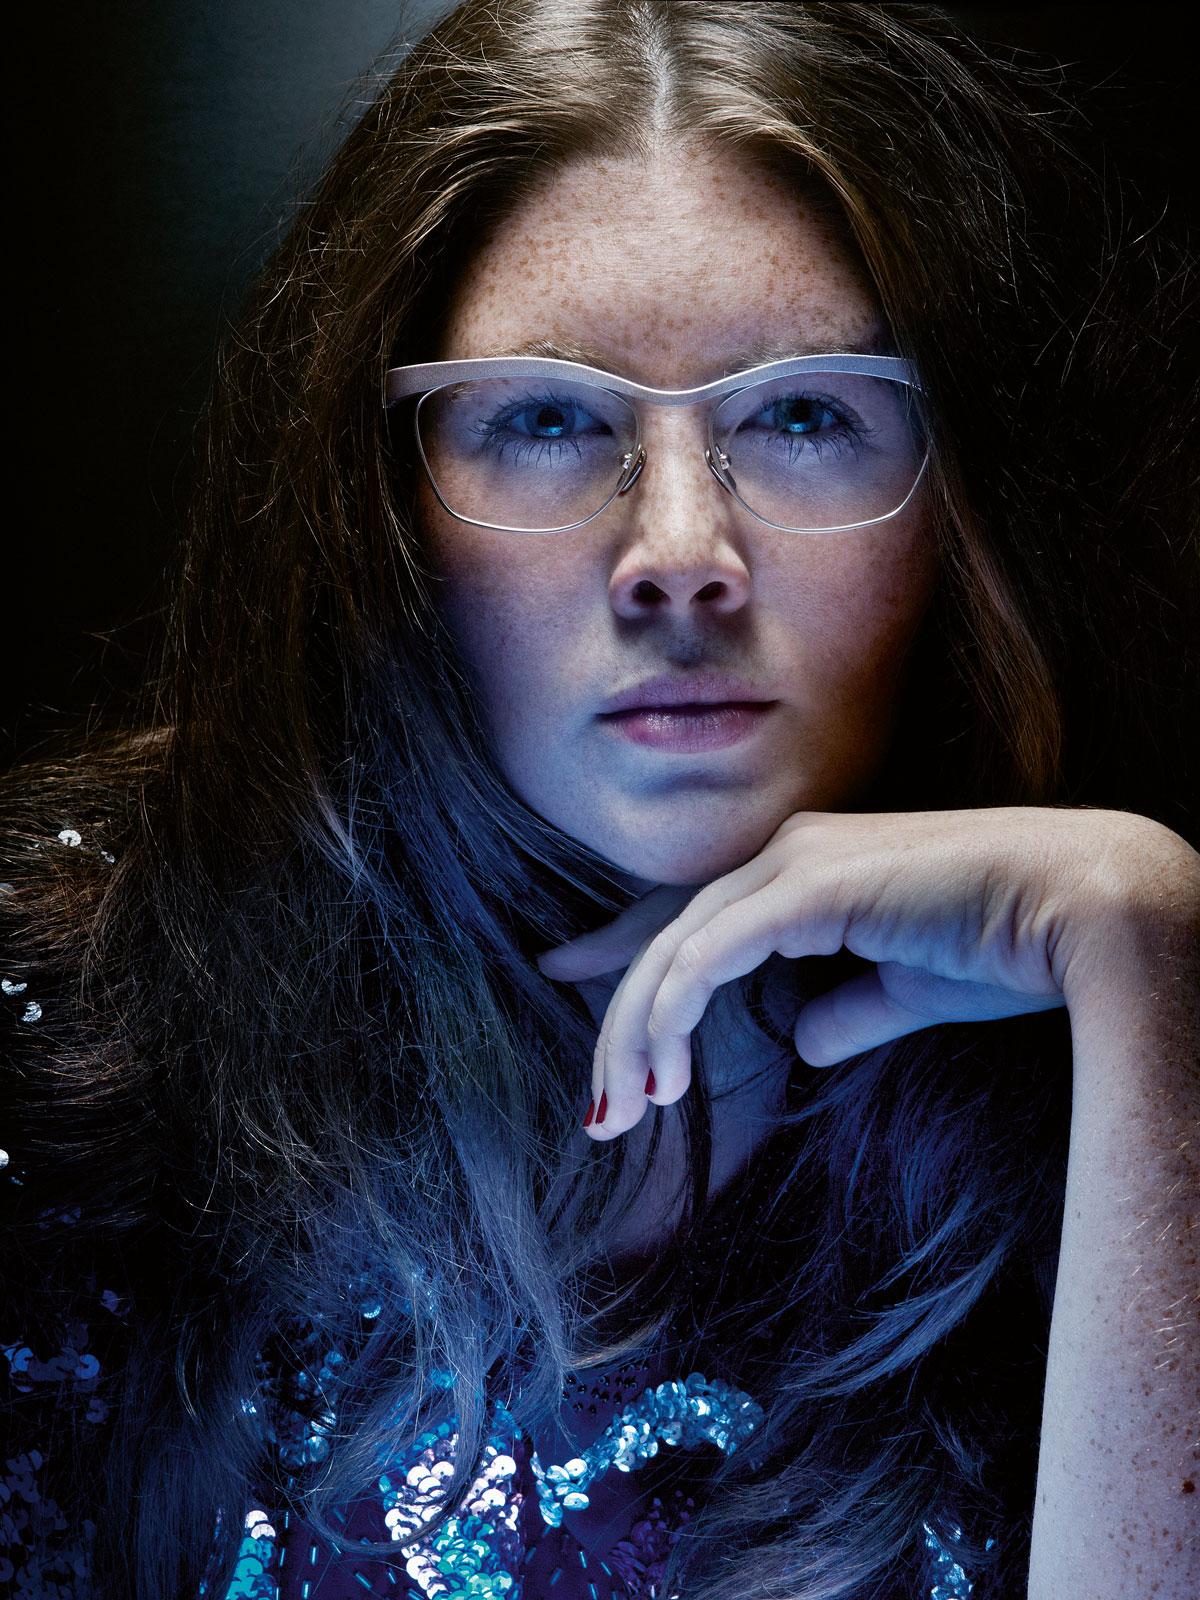 rxfreaks_Willems-Wonderglasses-'Charlotte'